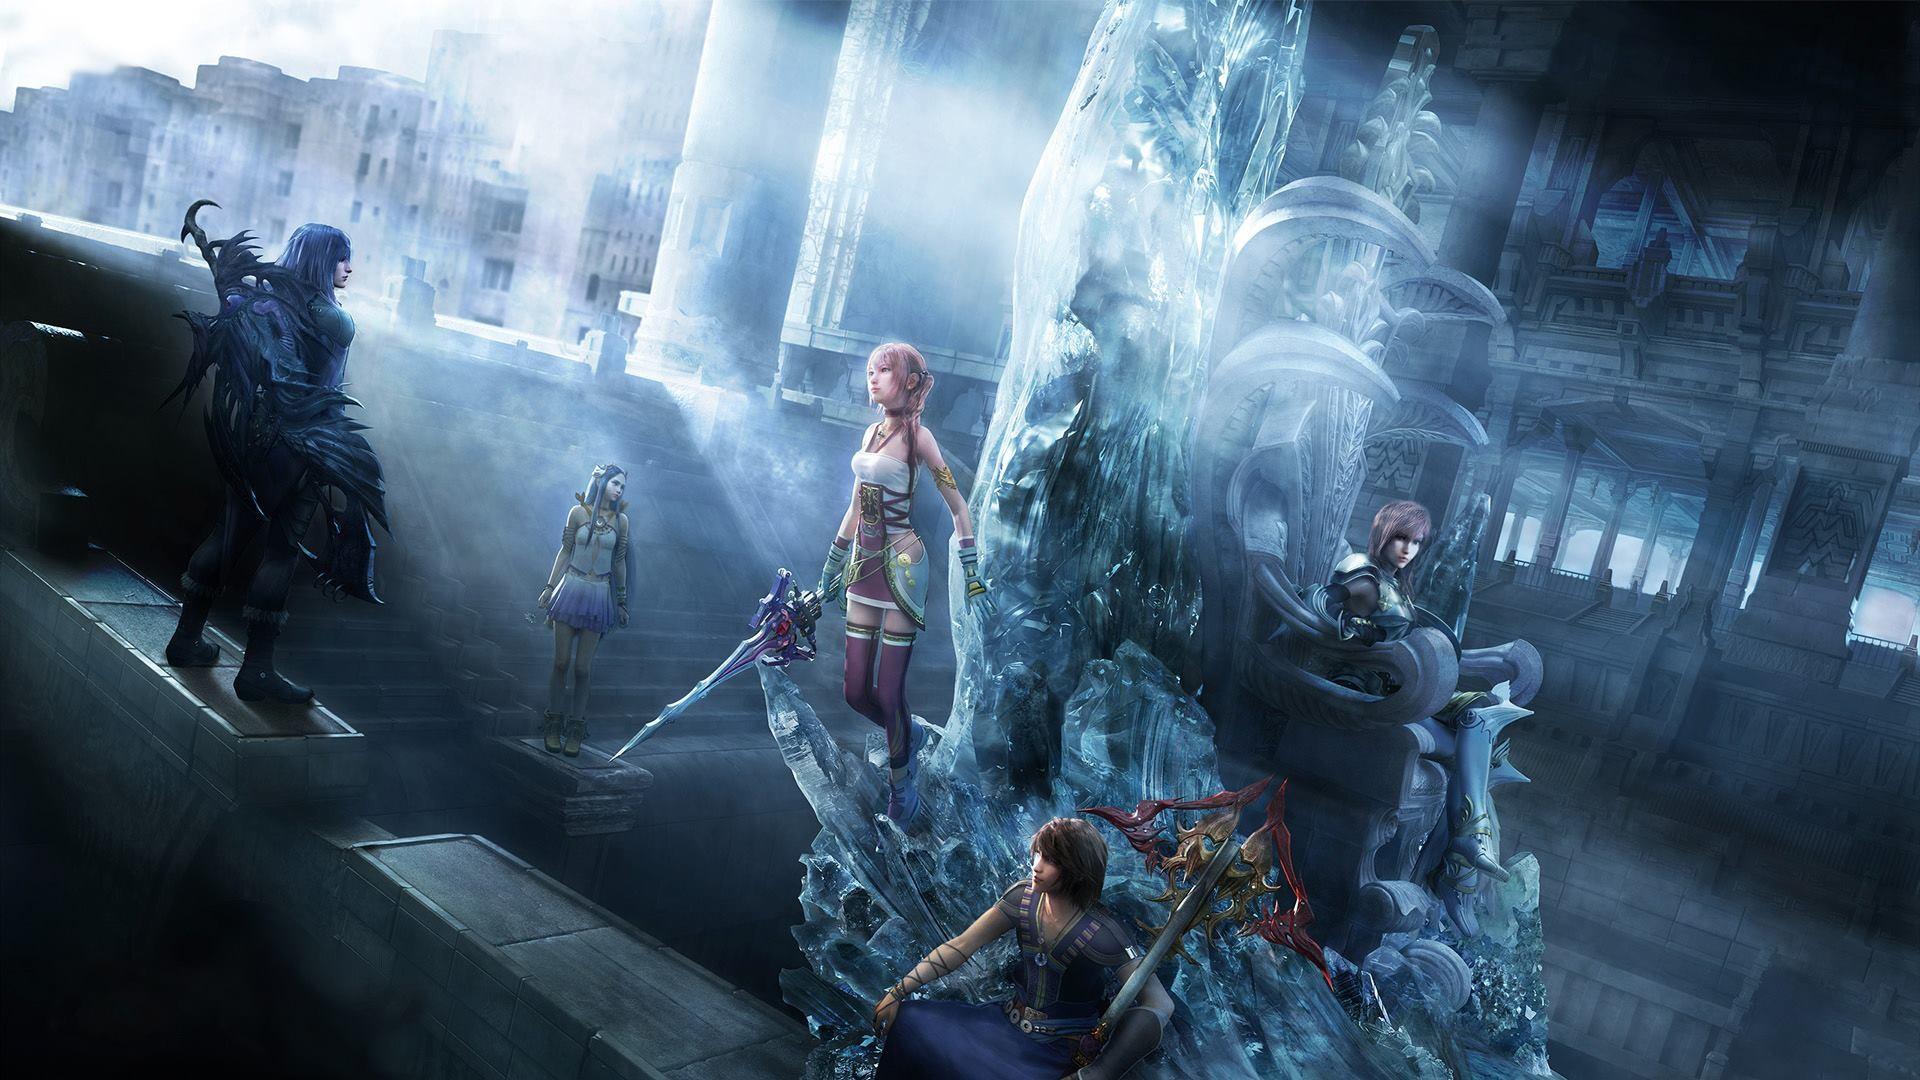 Tetsuya Square Enix Final Fantasy Vii Zack Fair Cloud Strife Rude .